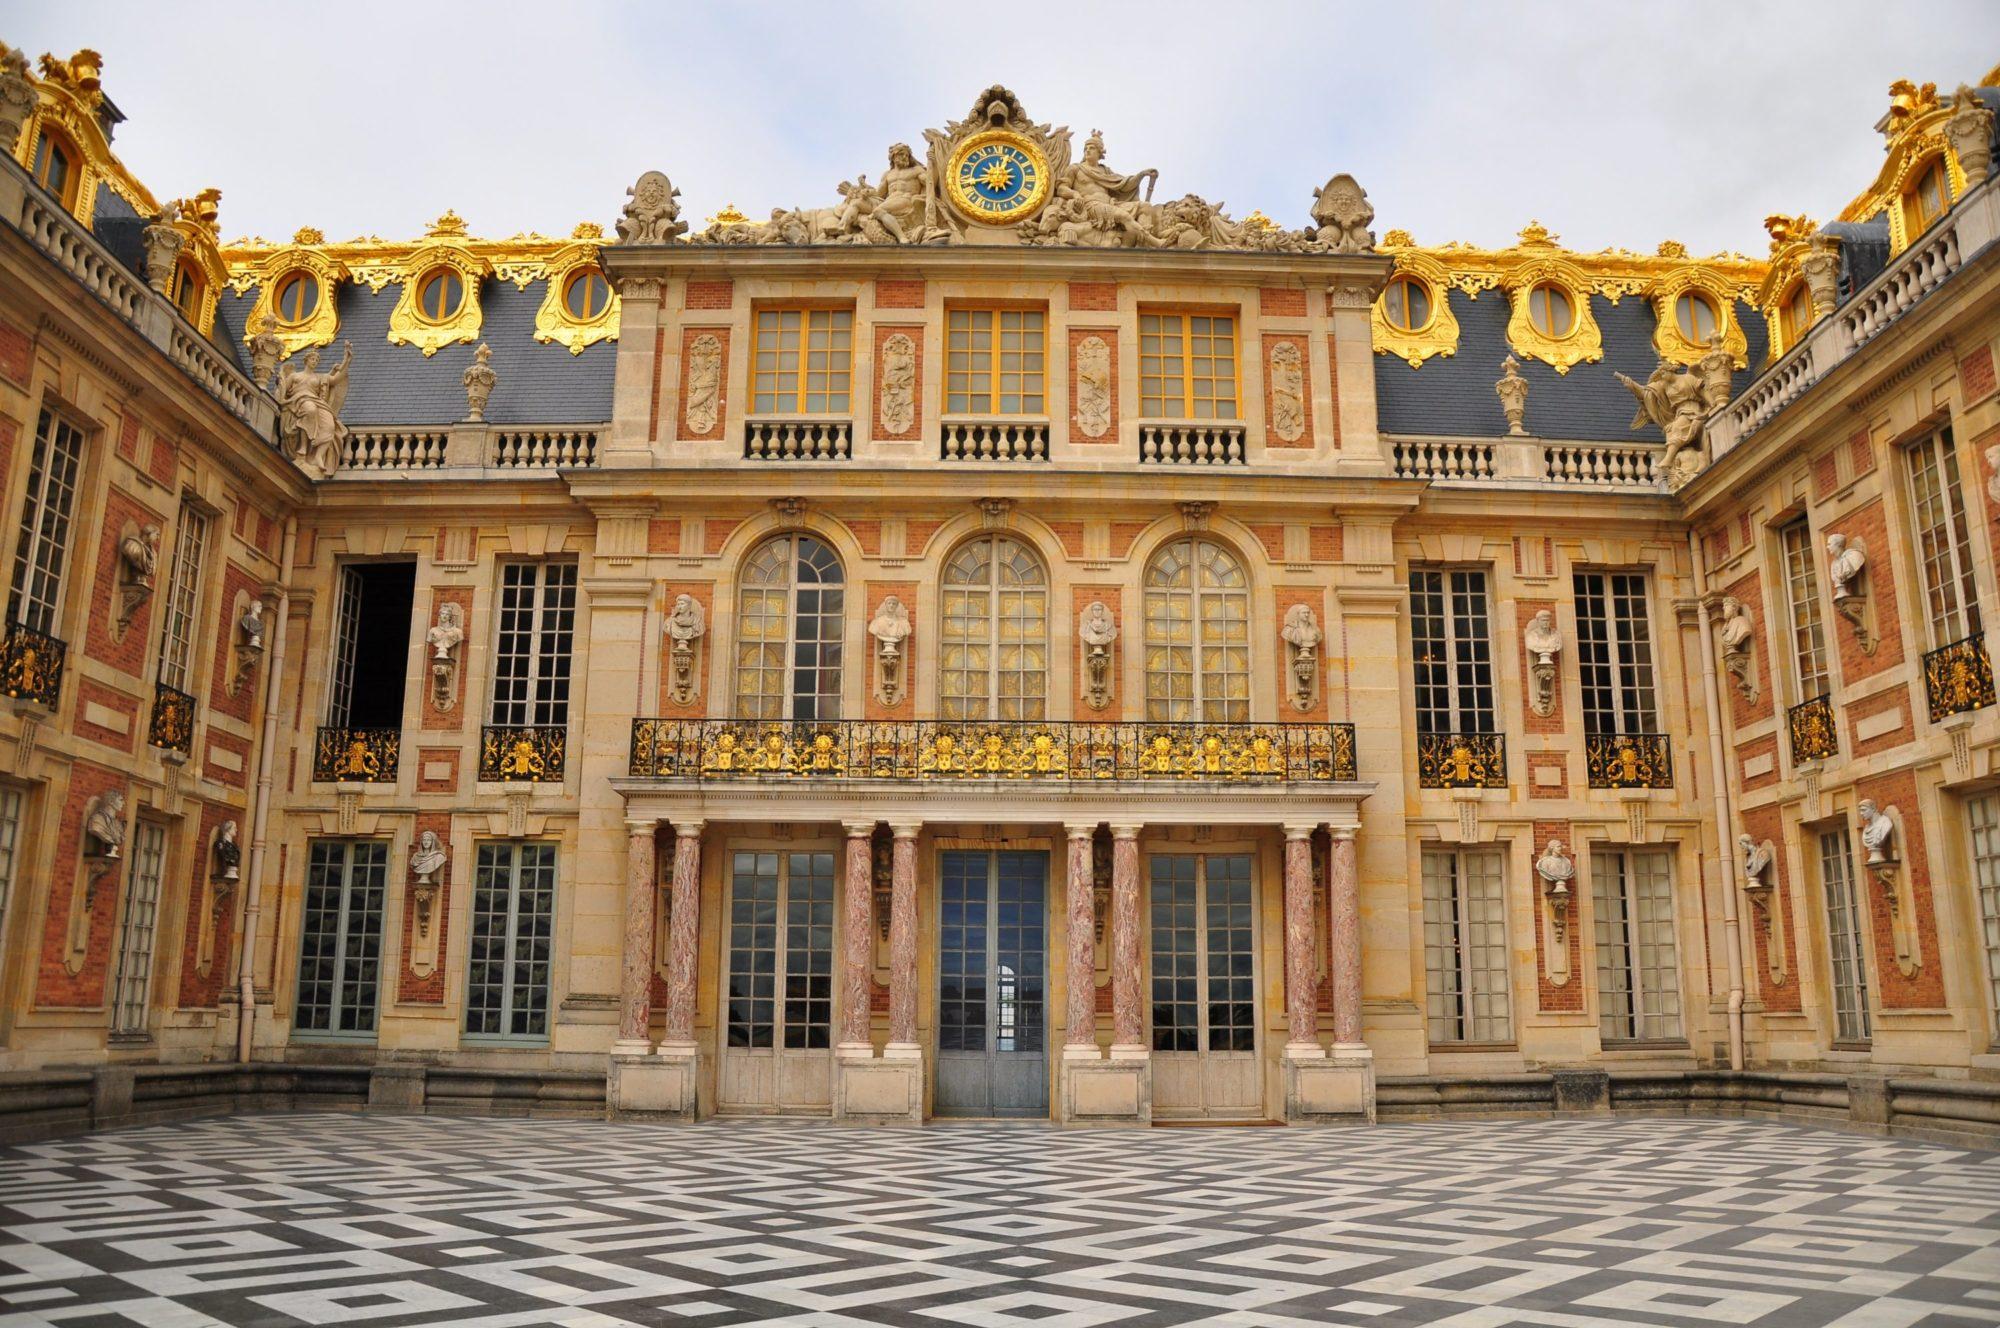 chateau de versailles e1535544357682 Architettura, lusso e sangue blu